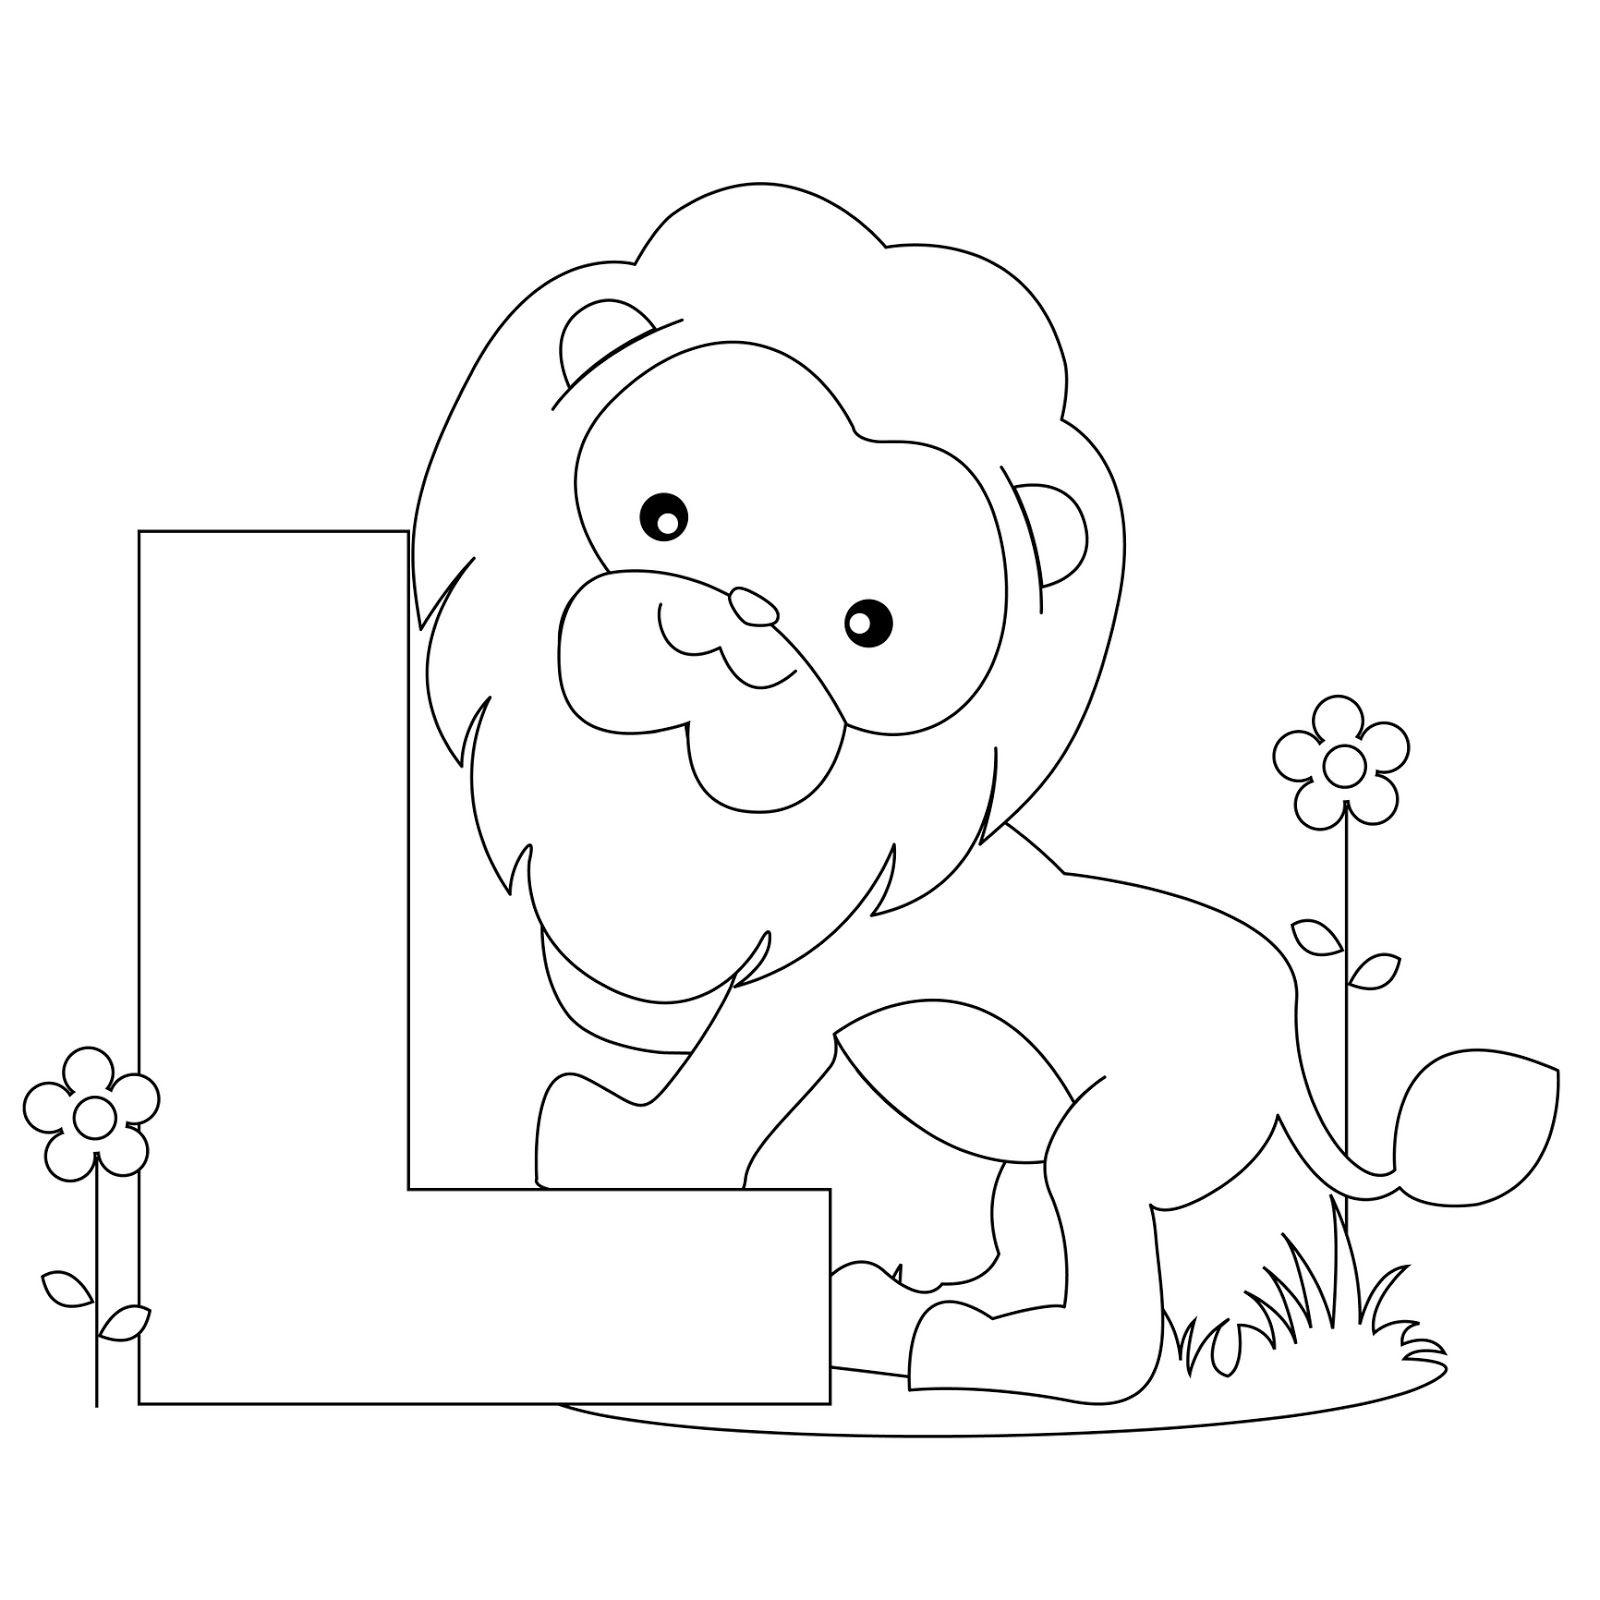 sesame street coloring pages alphabet - Animal Alphabet Letter L1 ...